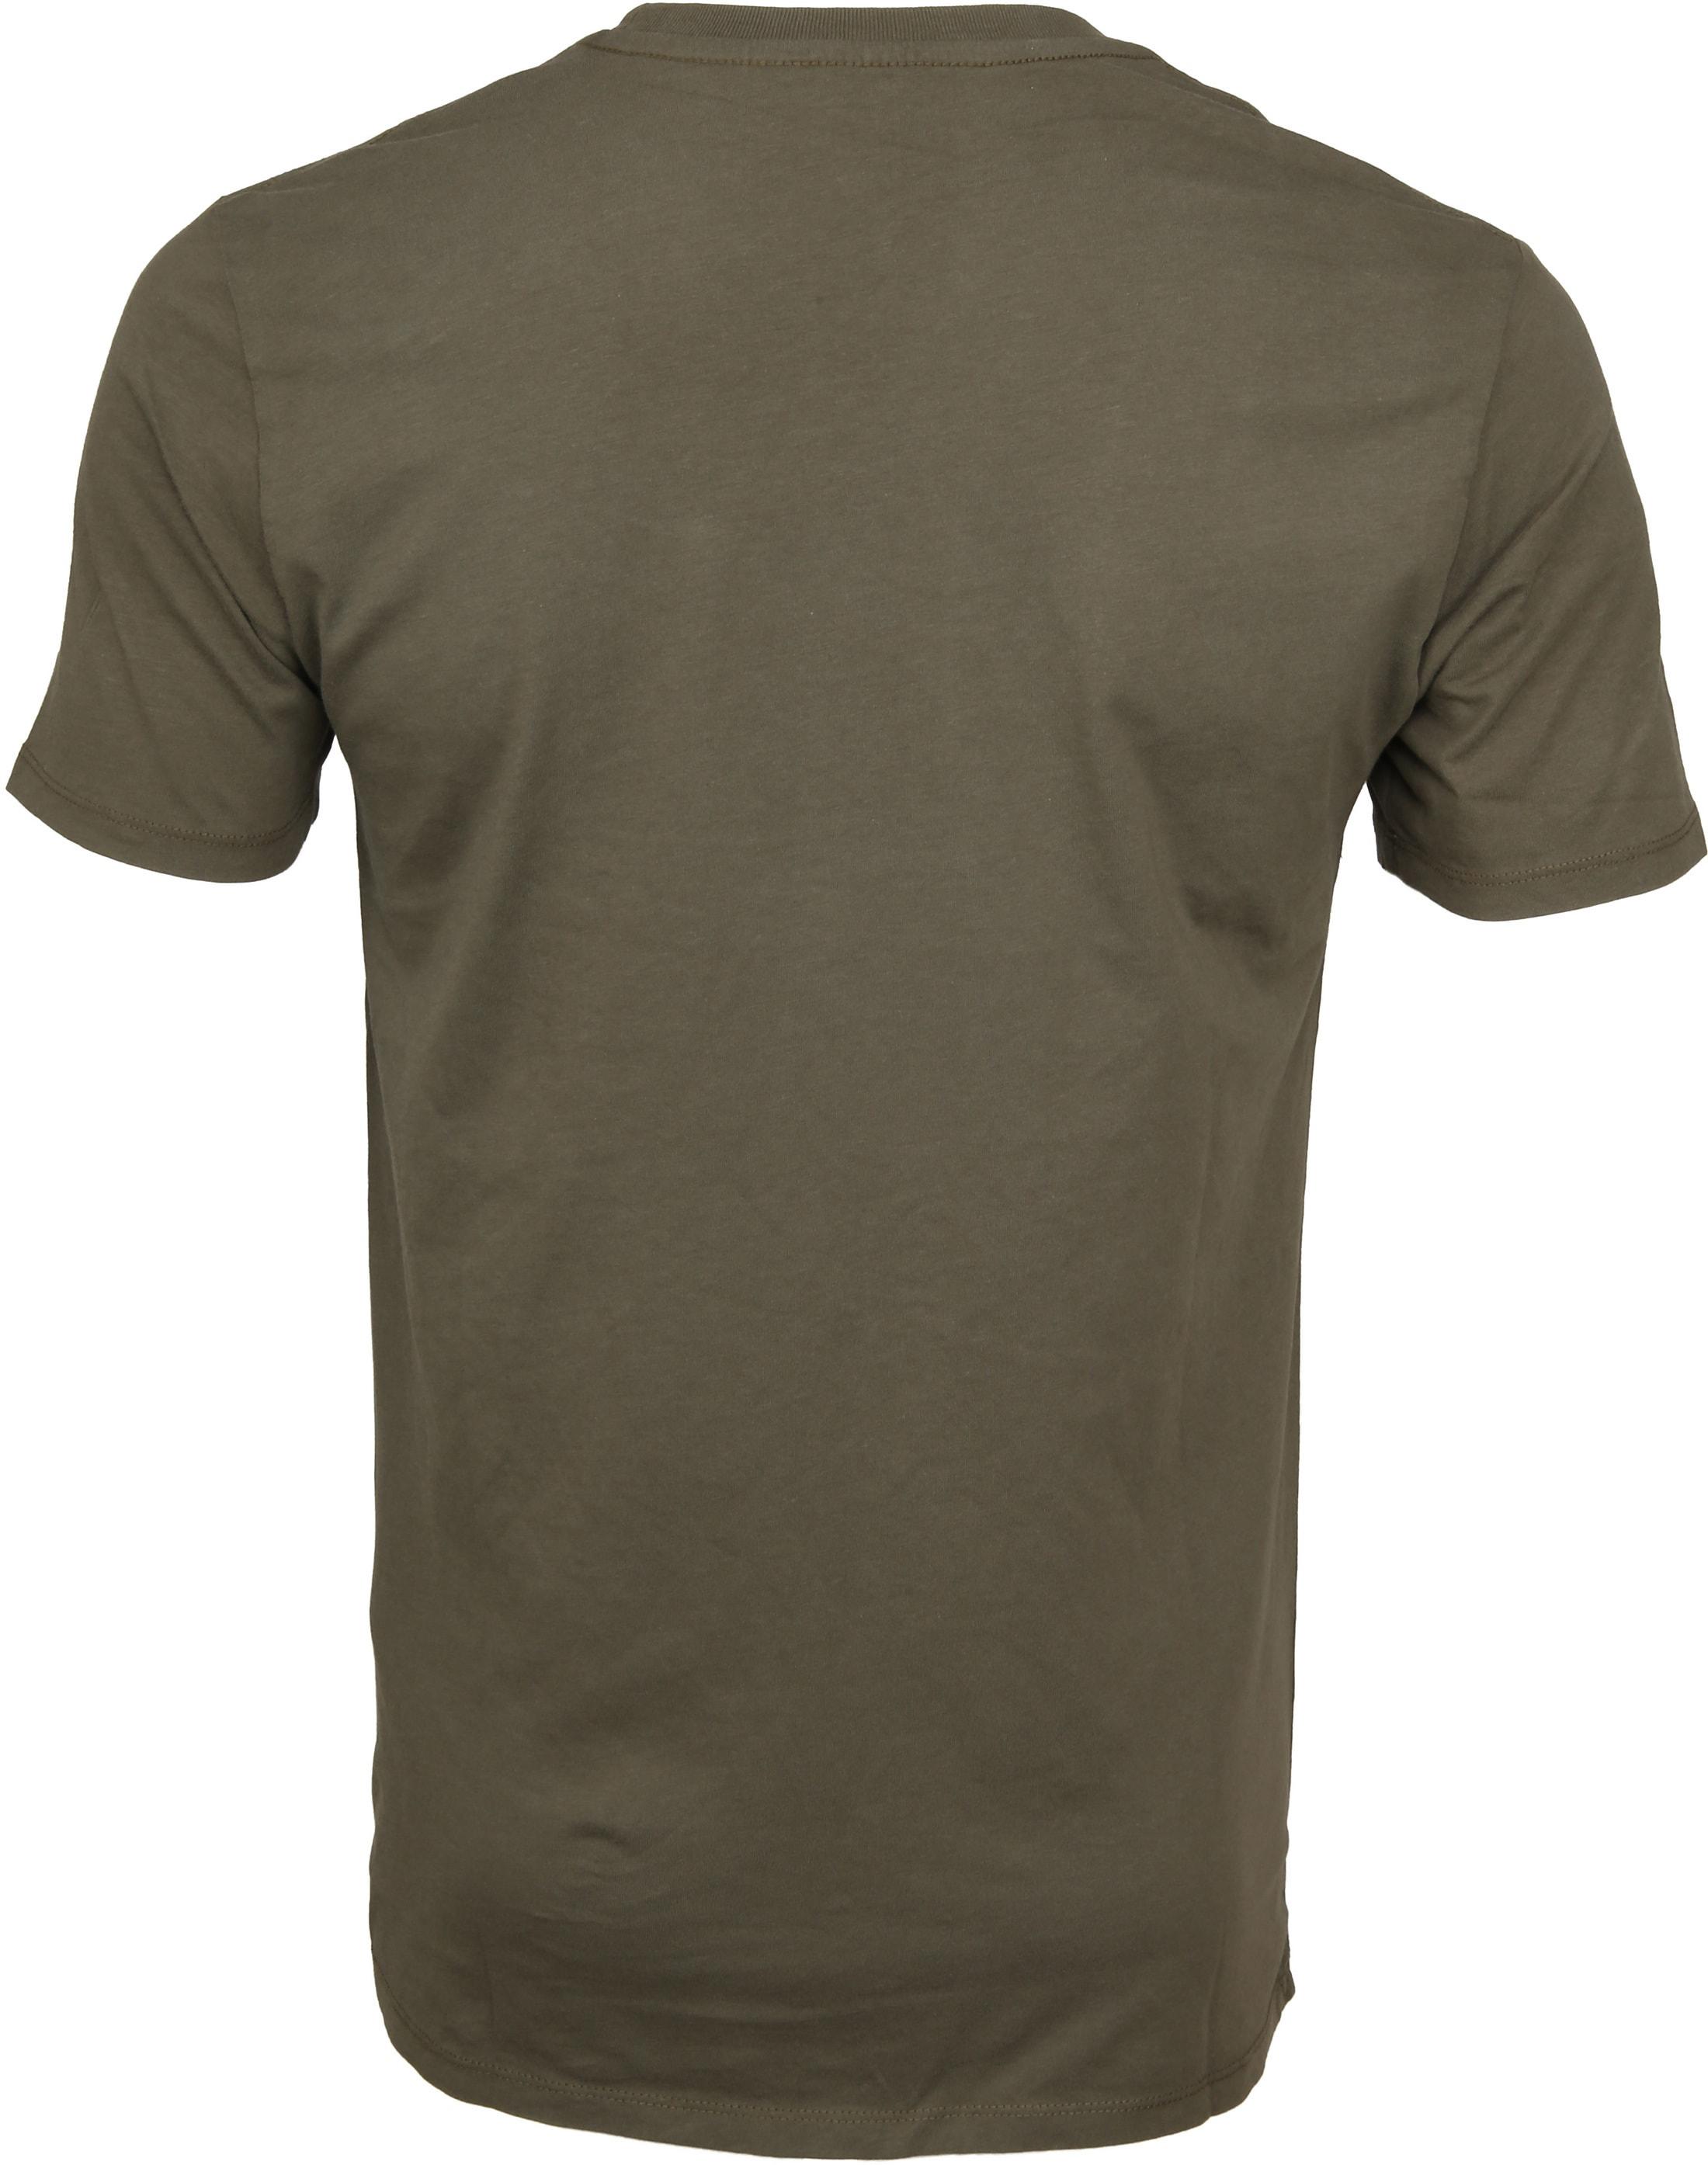 Levi's T-shirt Green Logo foto 2